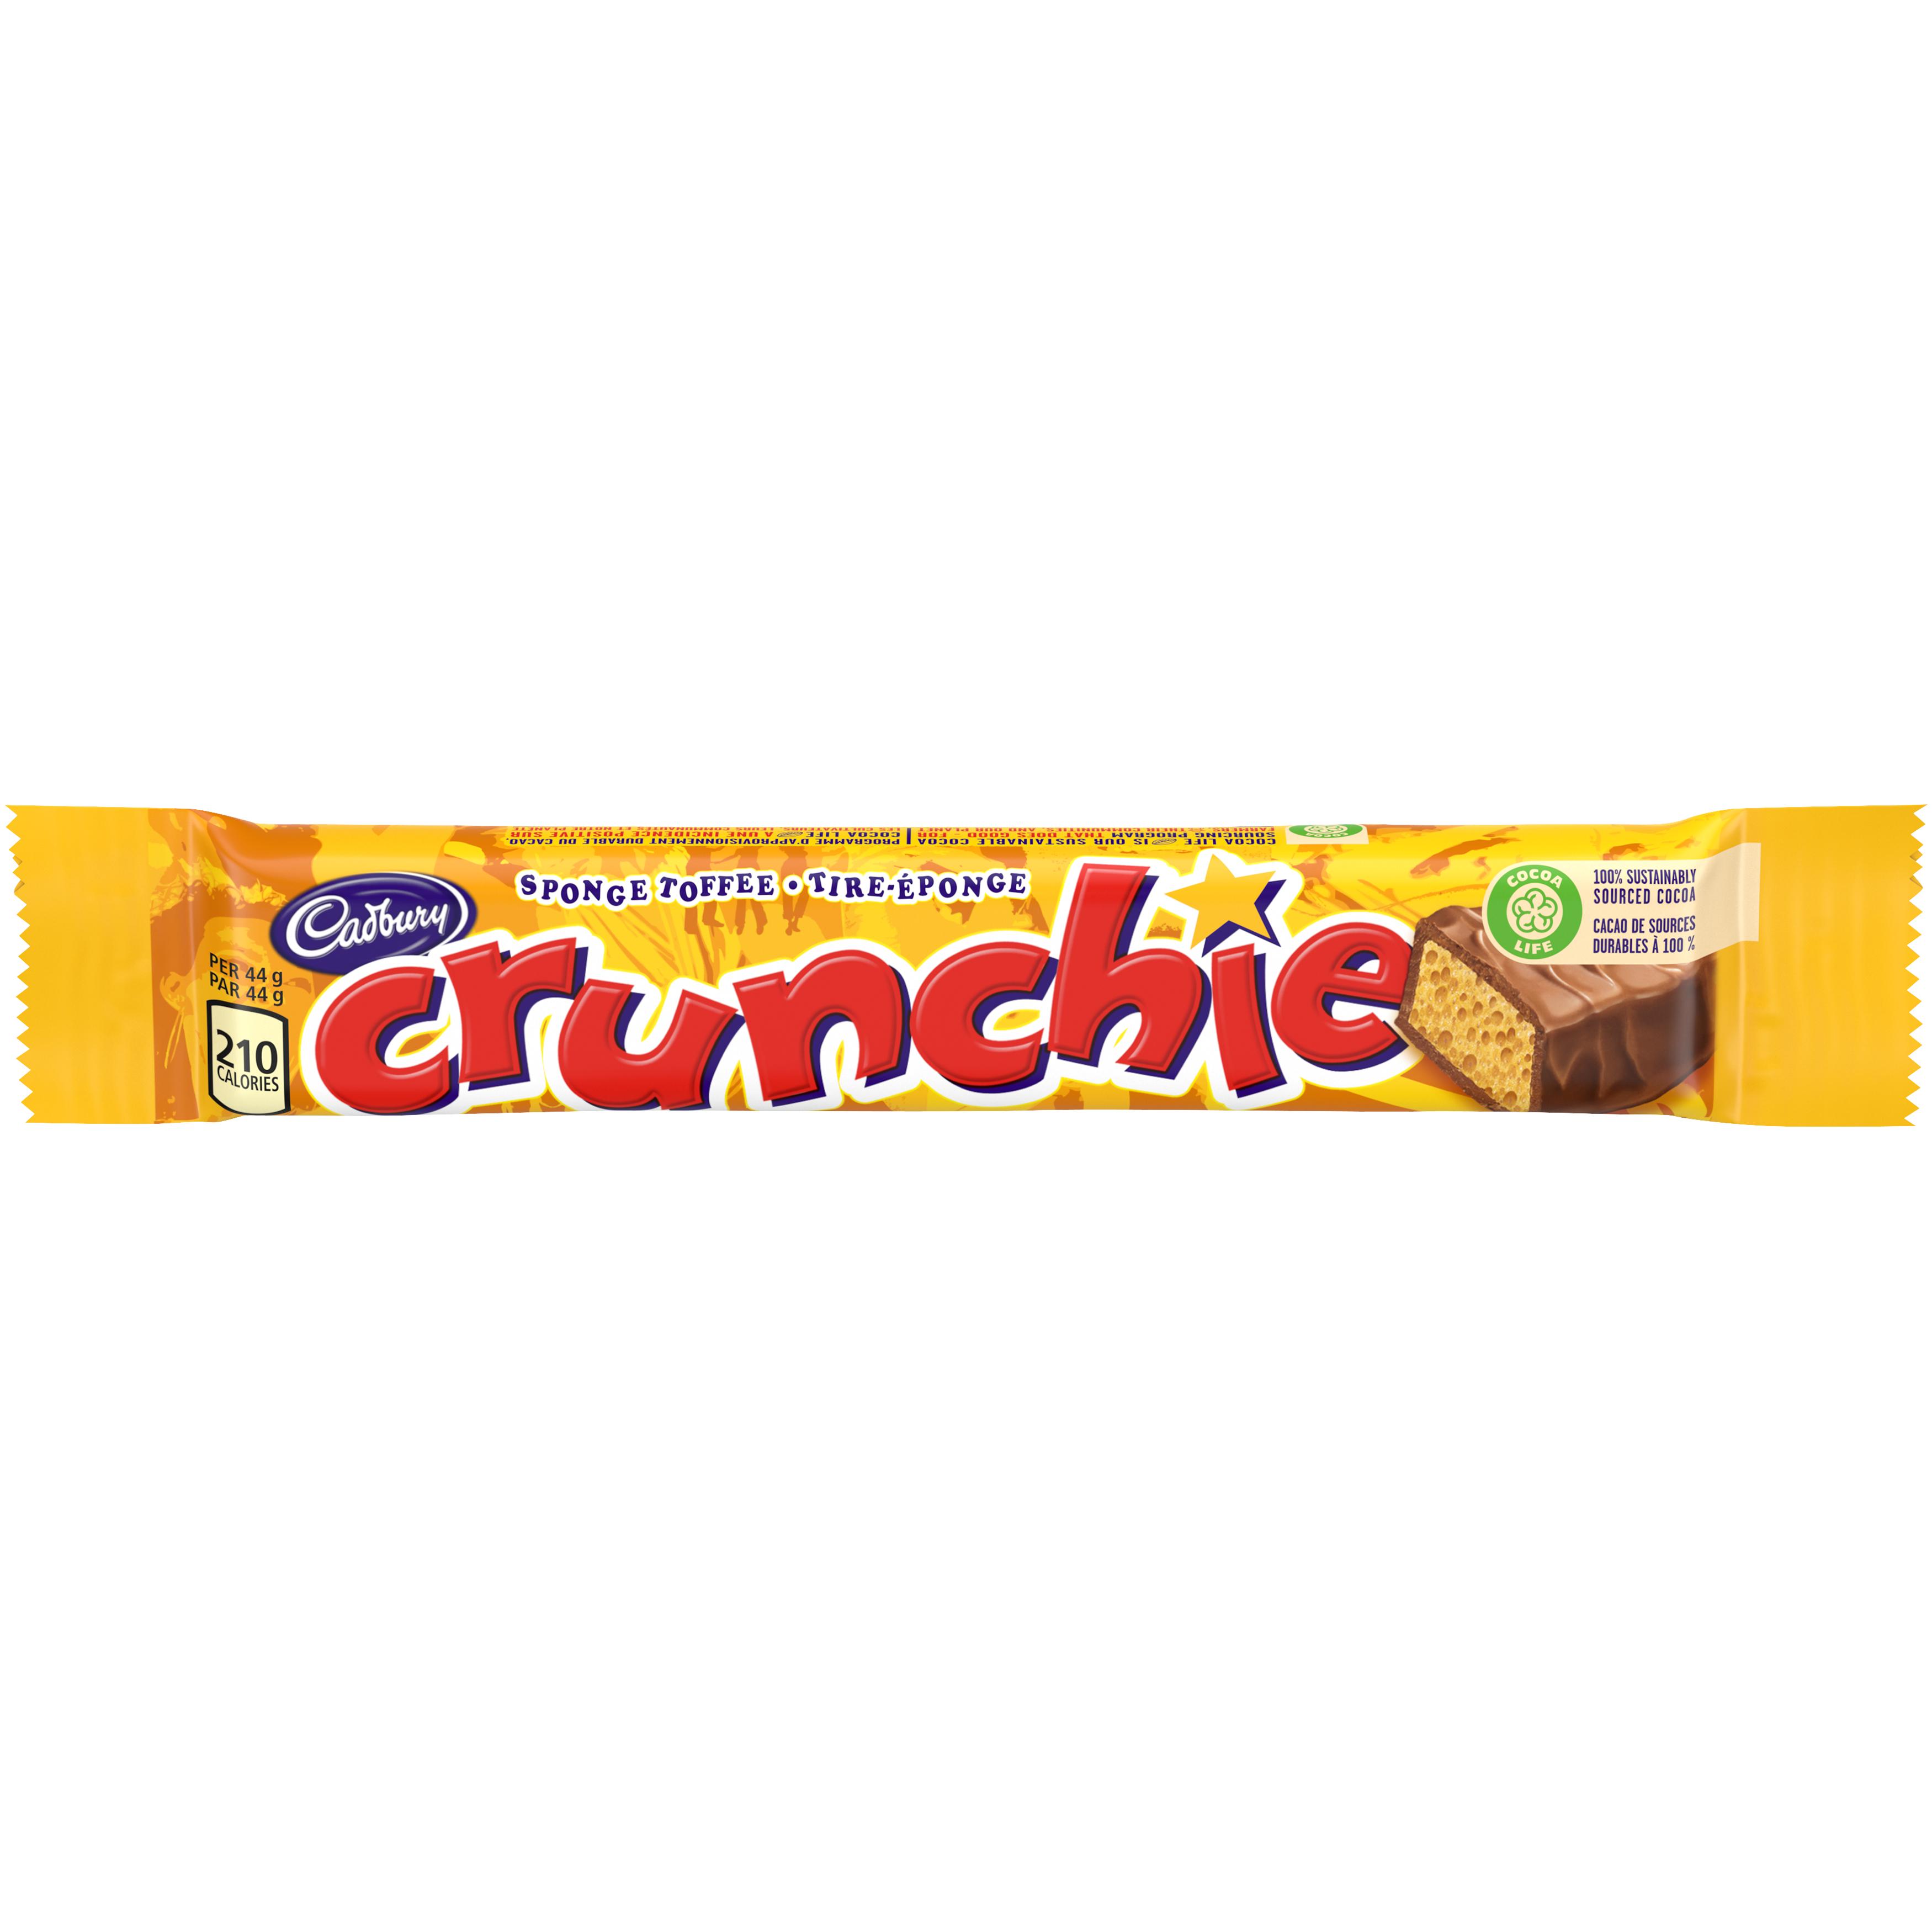 Crunchie Chocolate Bar 44 G